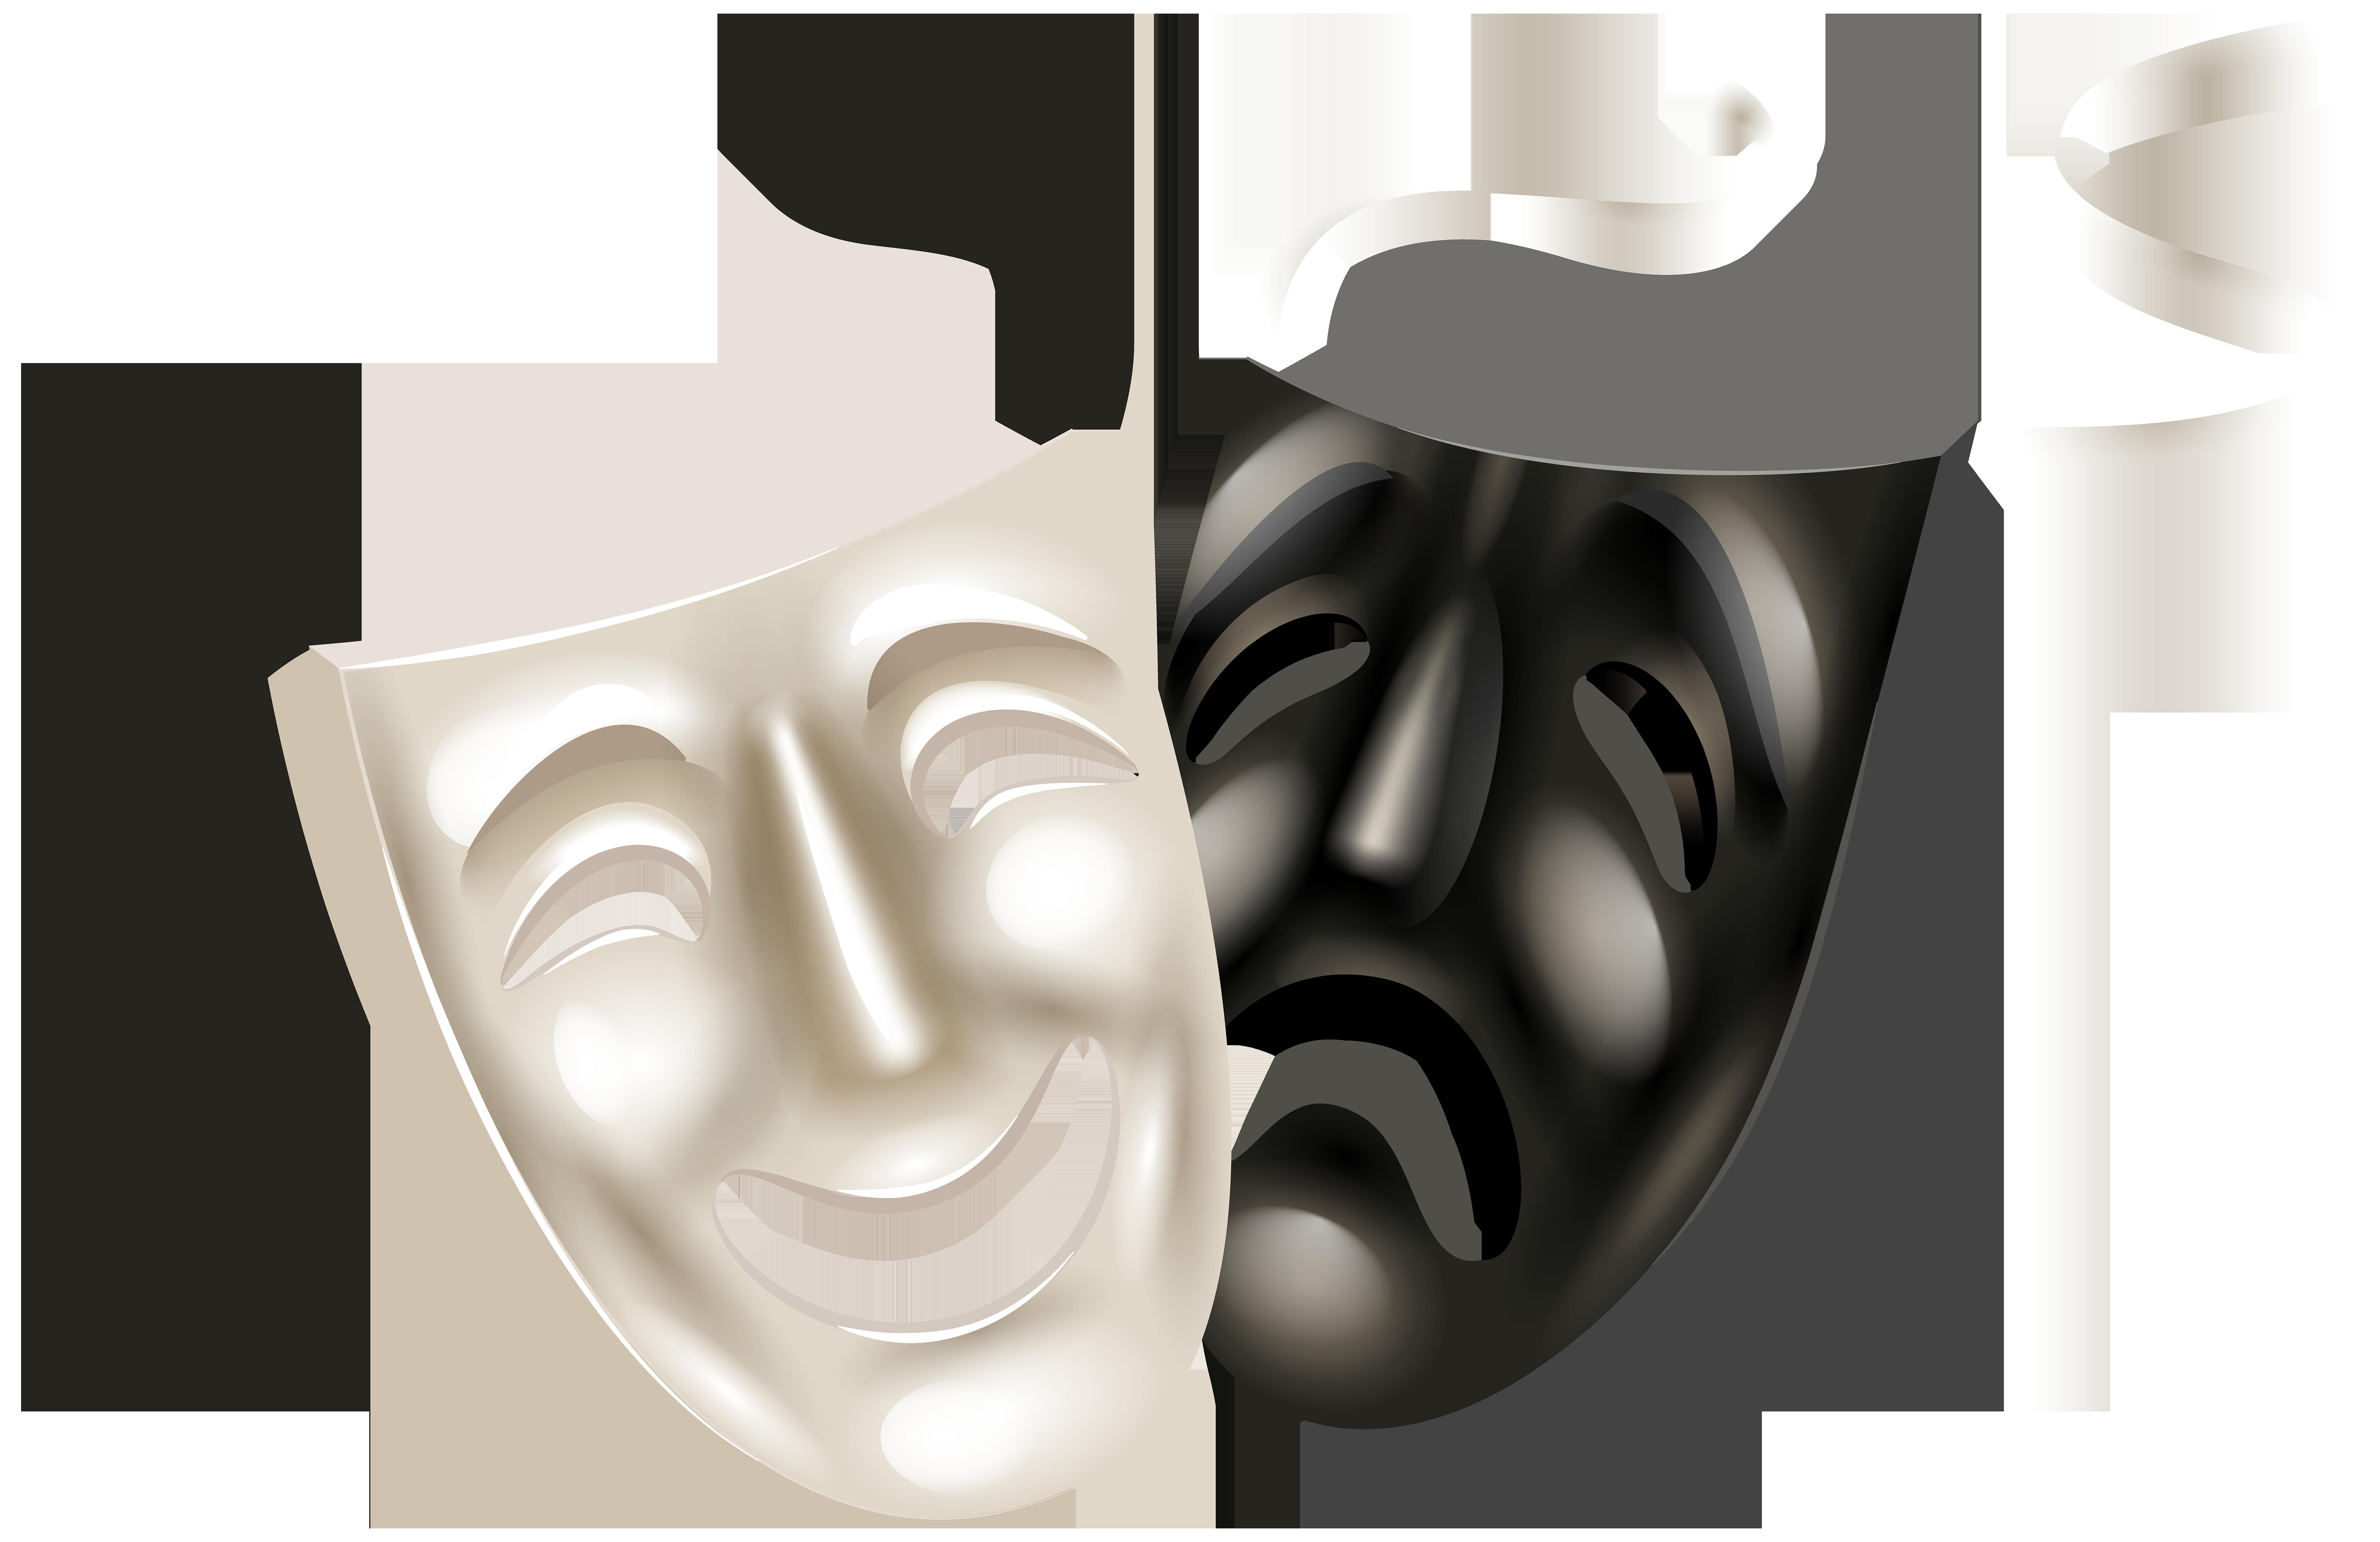 Drama clipart technical theatre. Mask clip art png